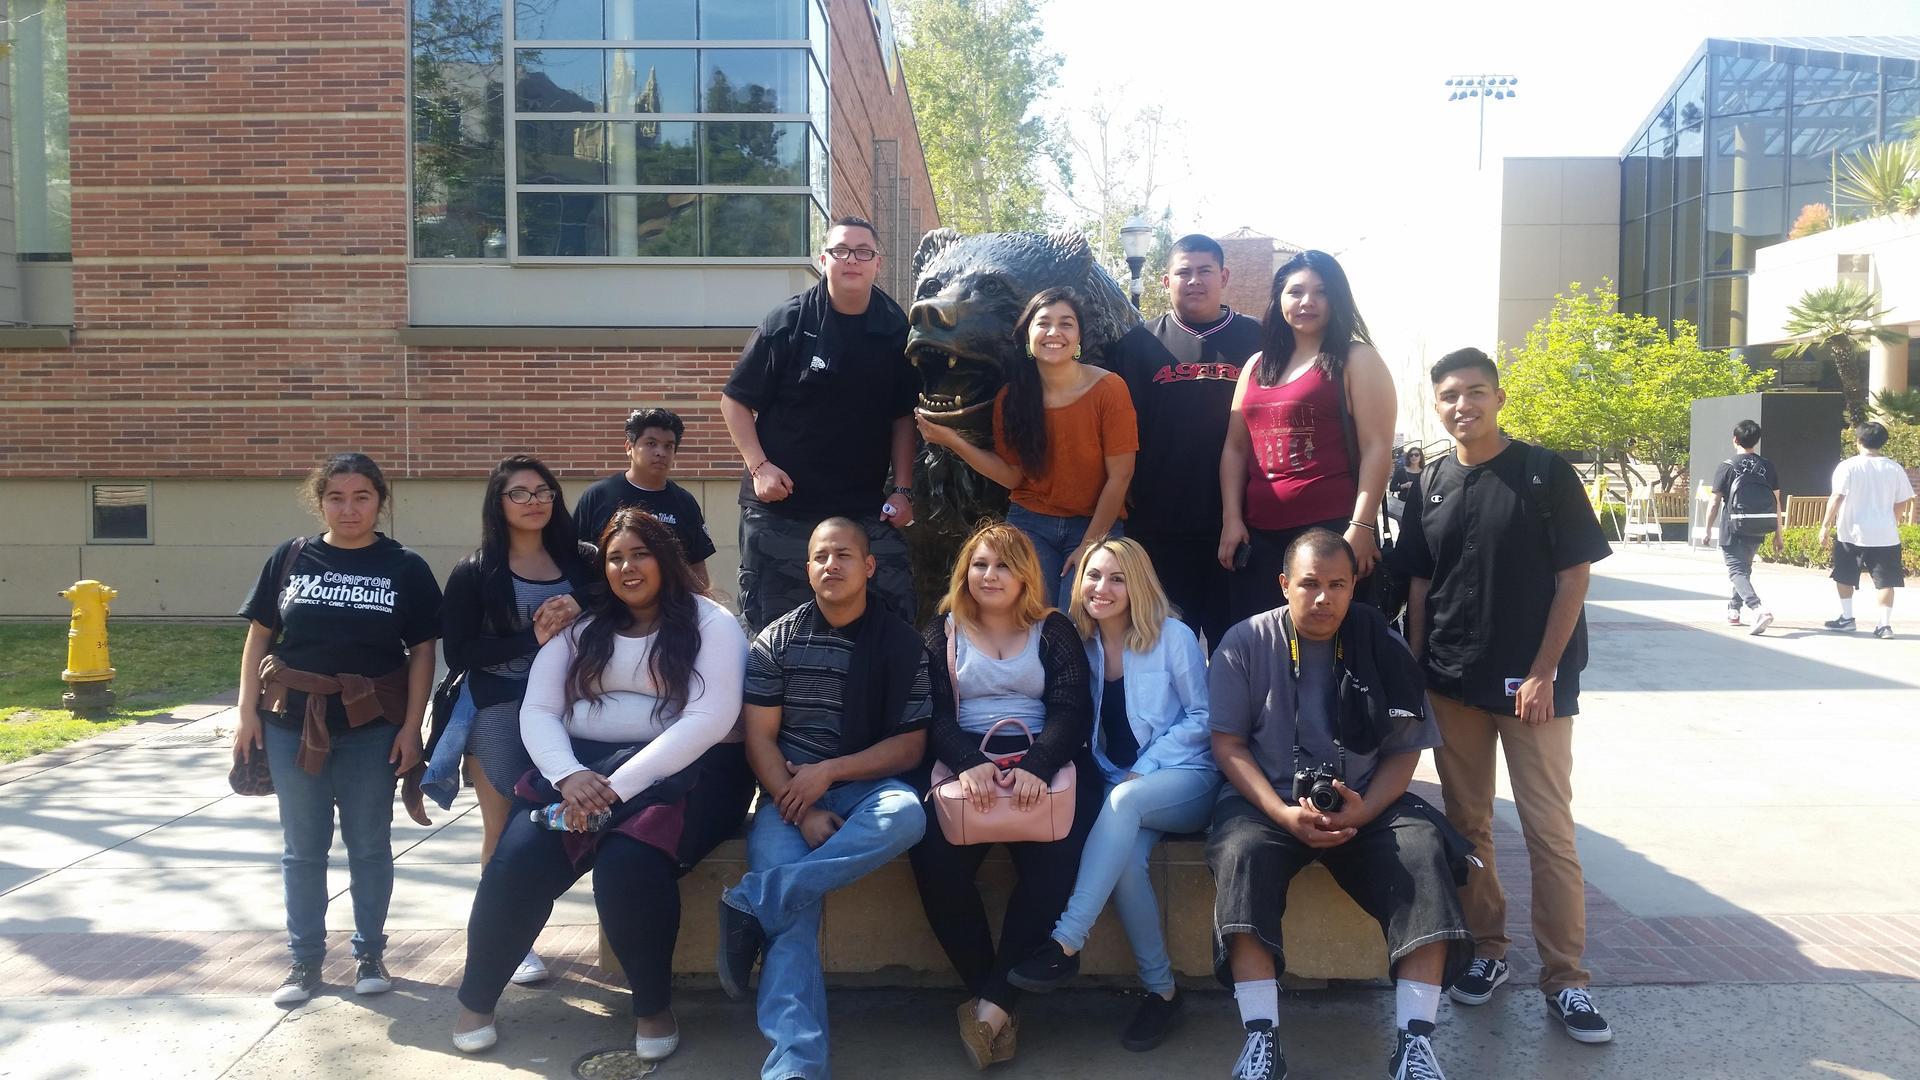 Compton trip to UCLA